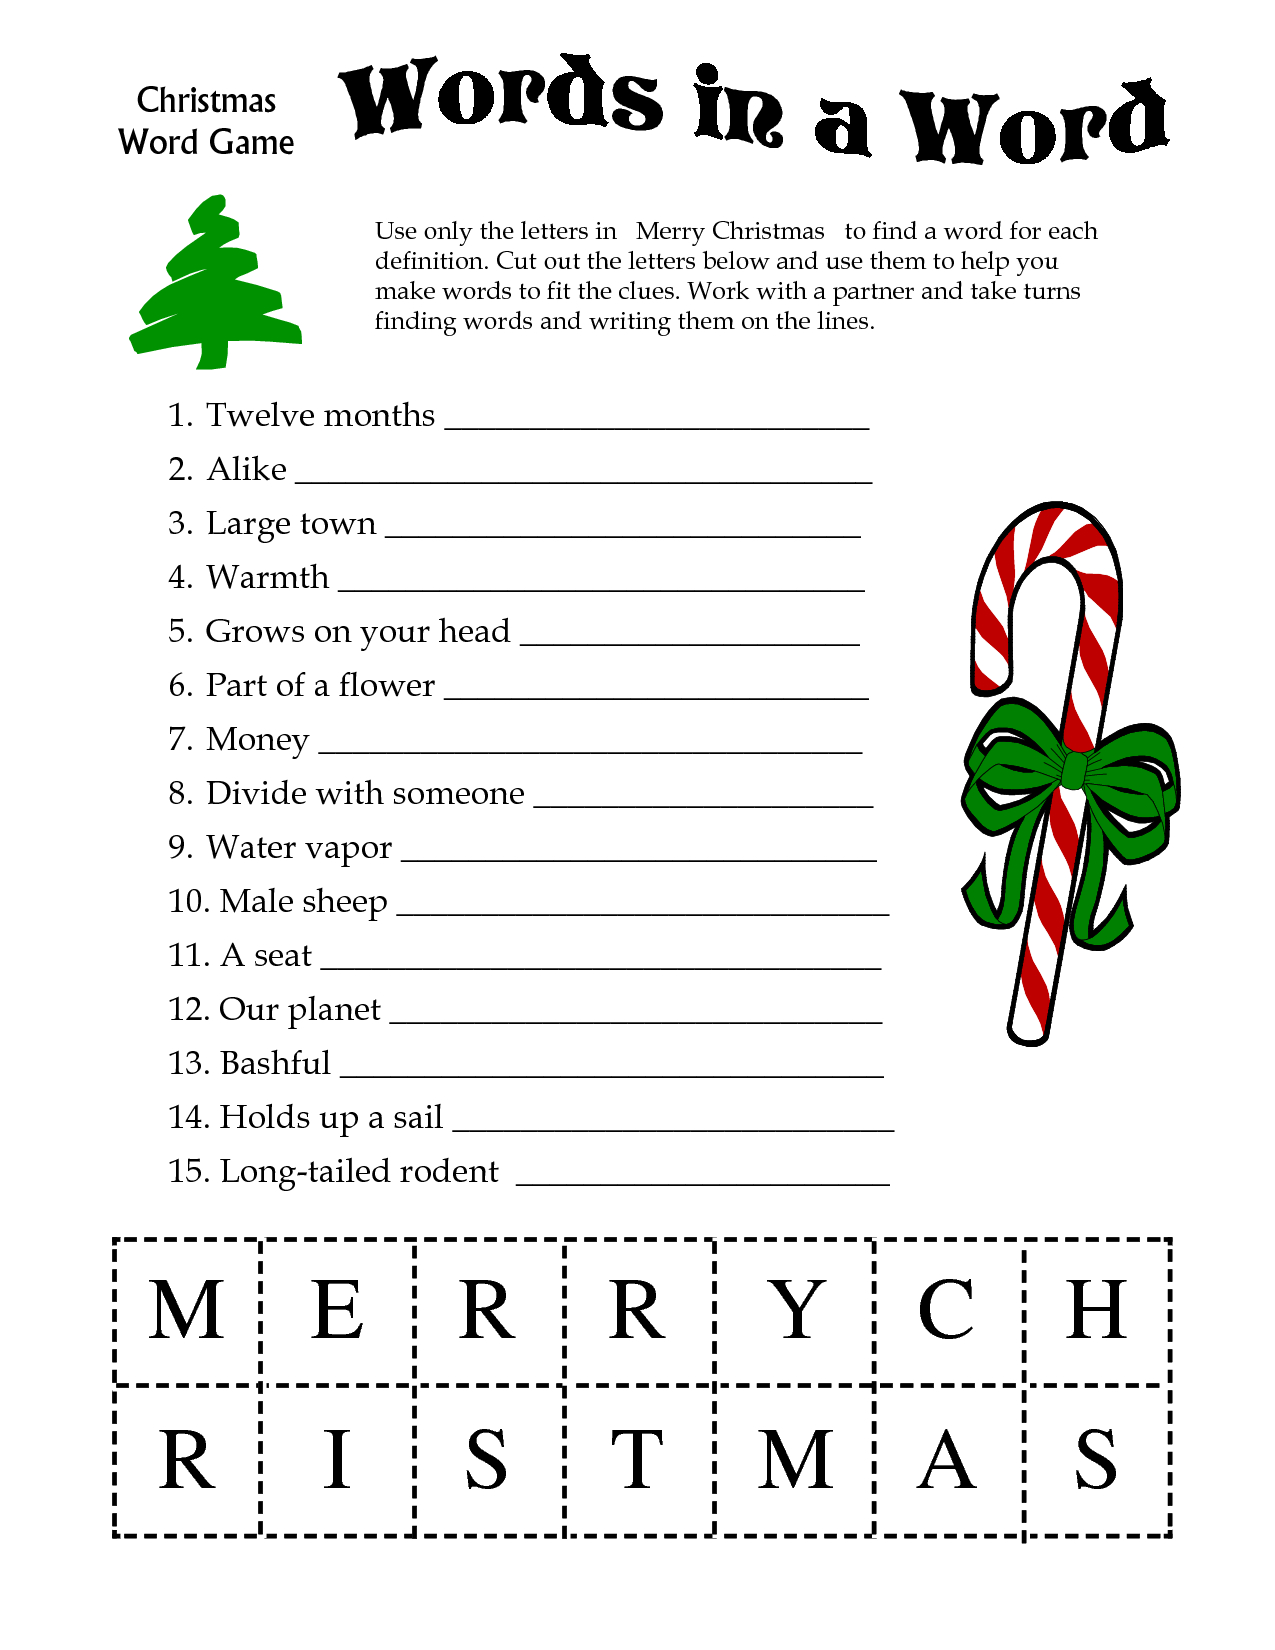 5 Images Of Free Printable Christmas Word Games   Printablee - Free Printable Christmas Word Games